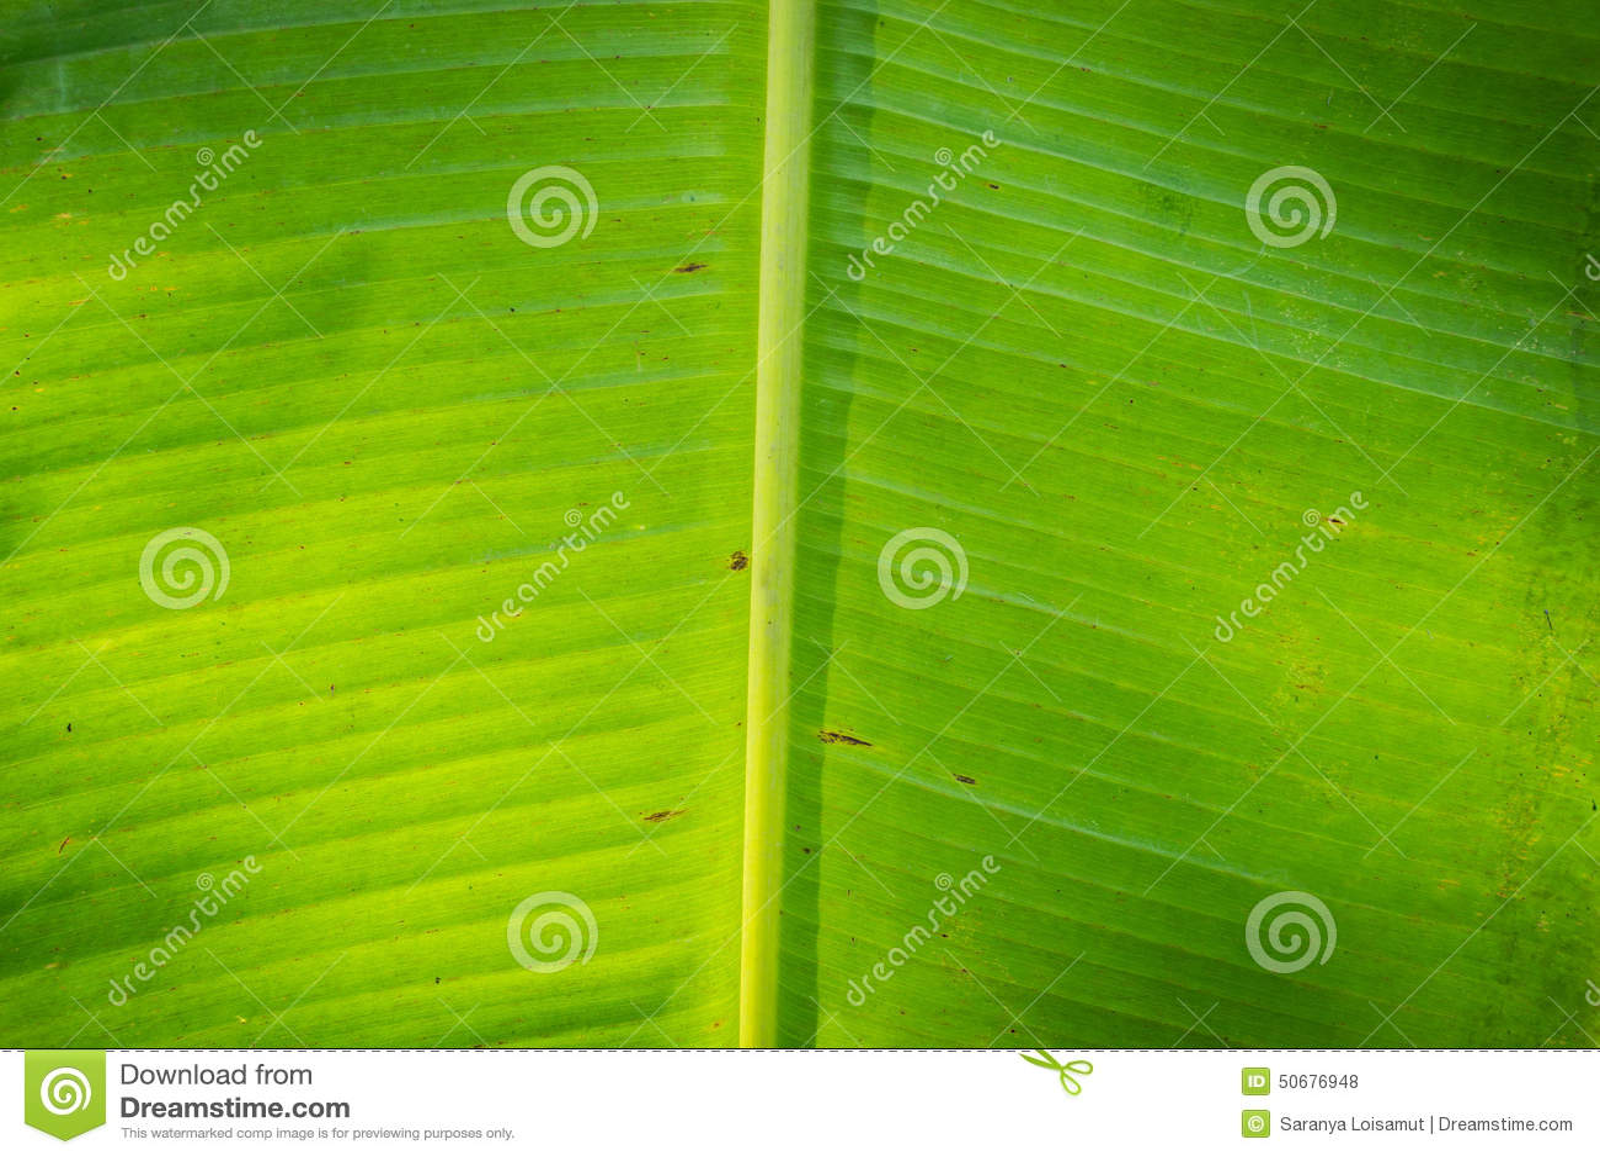 Download 香蕉叶子 库存照片. 图片 包括有 生气勃勃, 容器, 环境, 植物群, 鲤鱼, 楼梯栏杆, 详细资料, 照亮 - 50676948